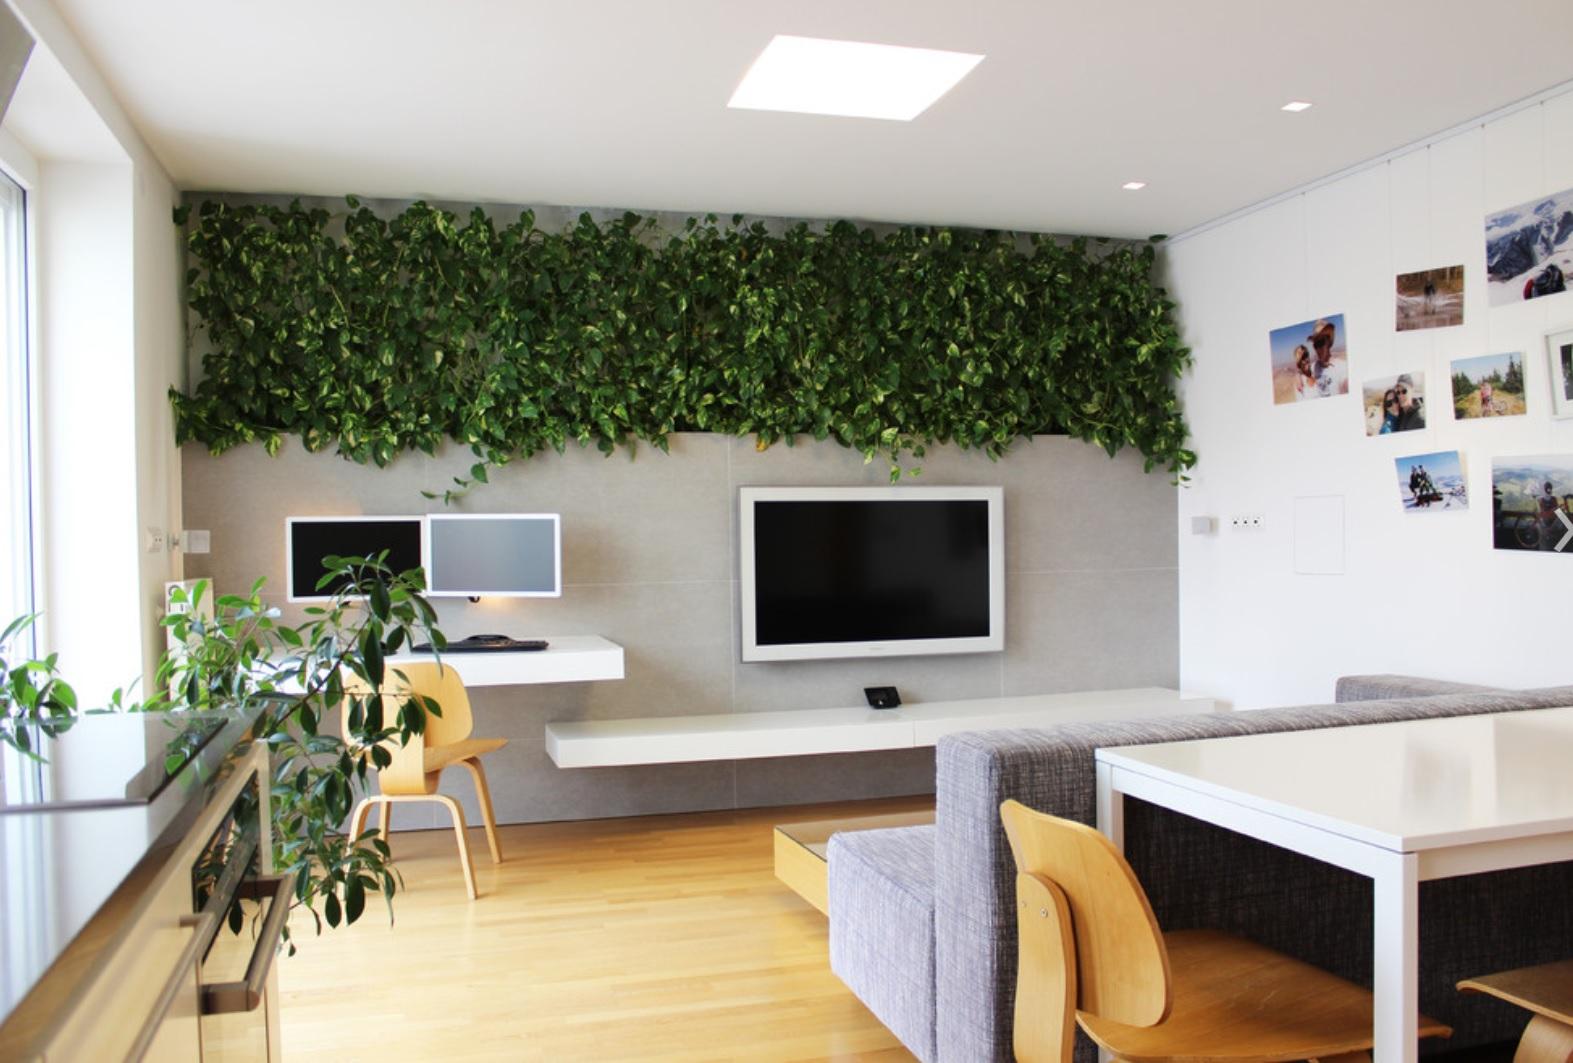 Meeting Room Wall Plants